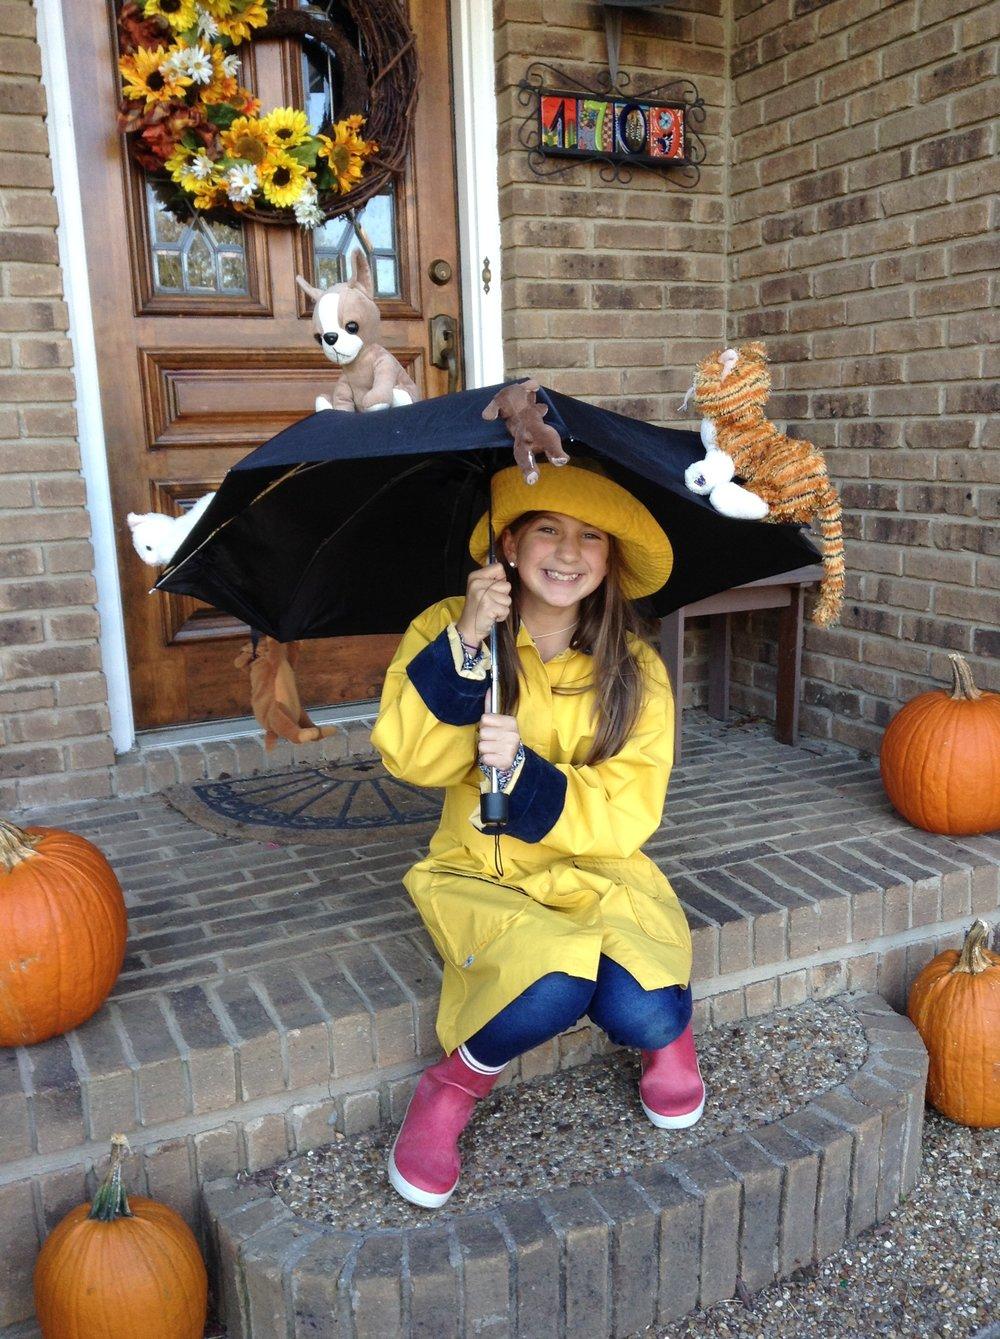 Lily Plewniak - It's Raining Cats and Dogs - stuffed animals, raincoat, hat.JPG